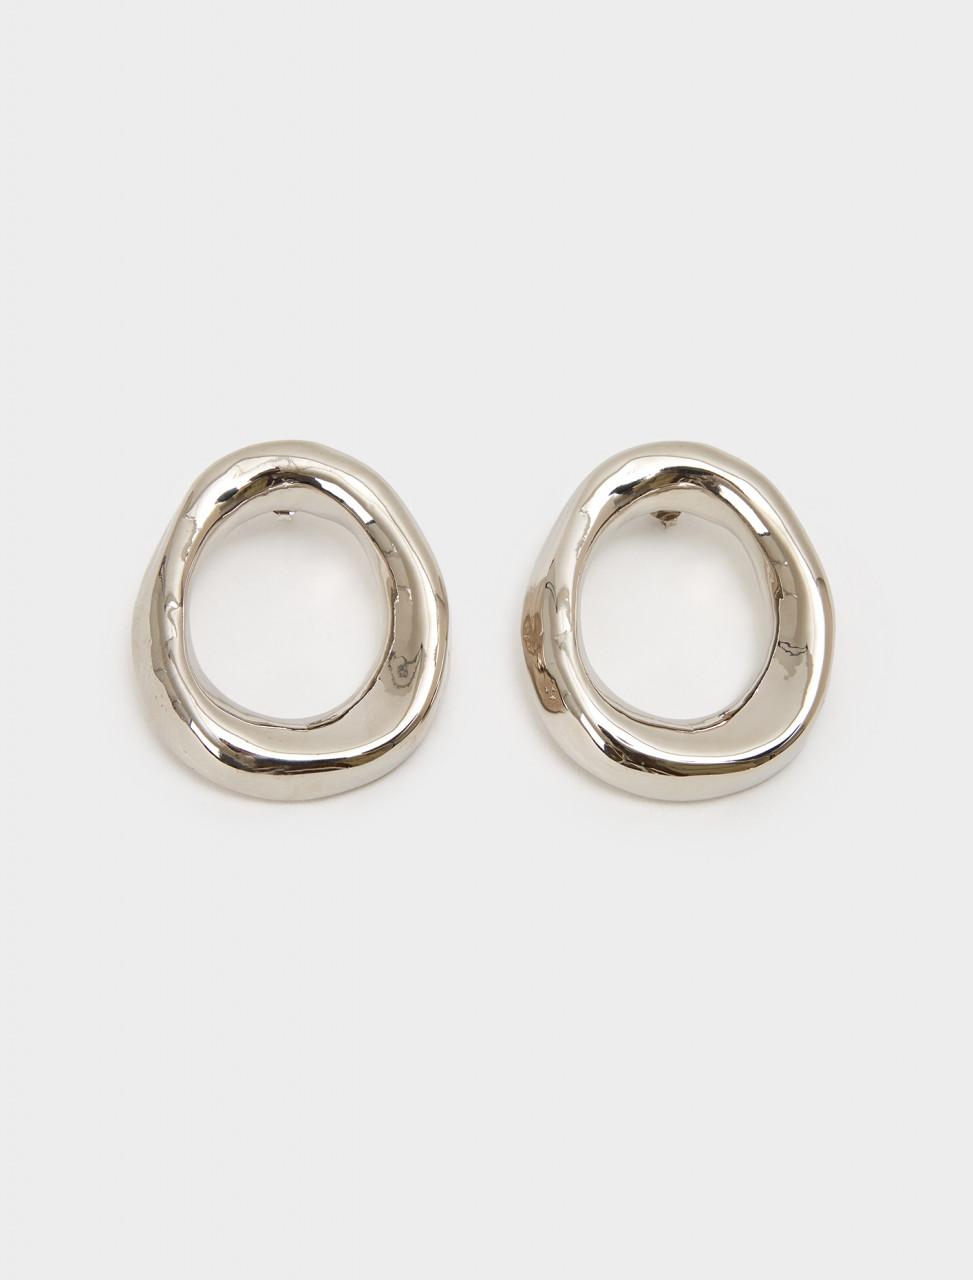 137-ORMV0244A0-M2000-00N29 MARNI LARGE CIRCLE EARRINGS